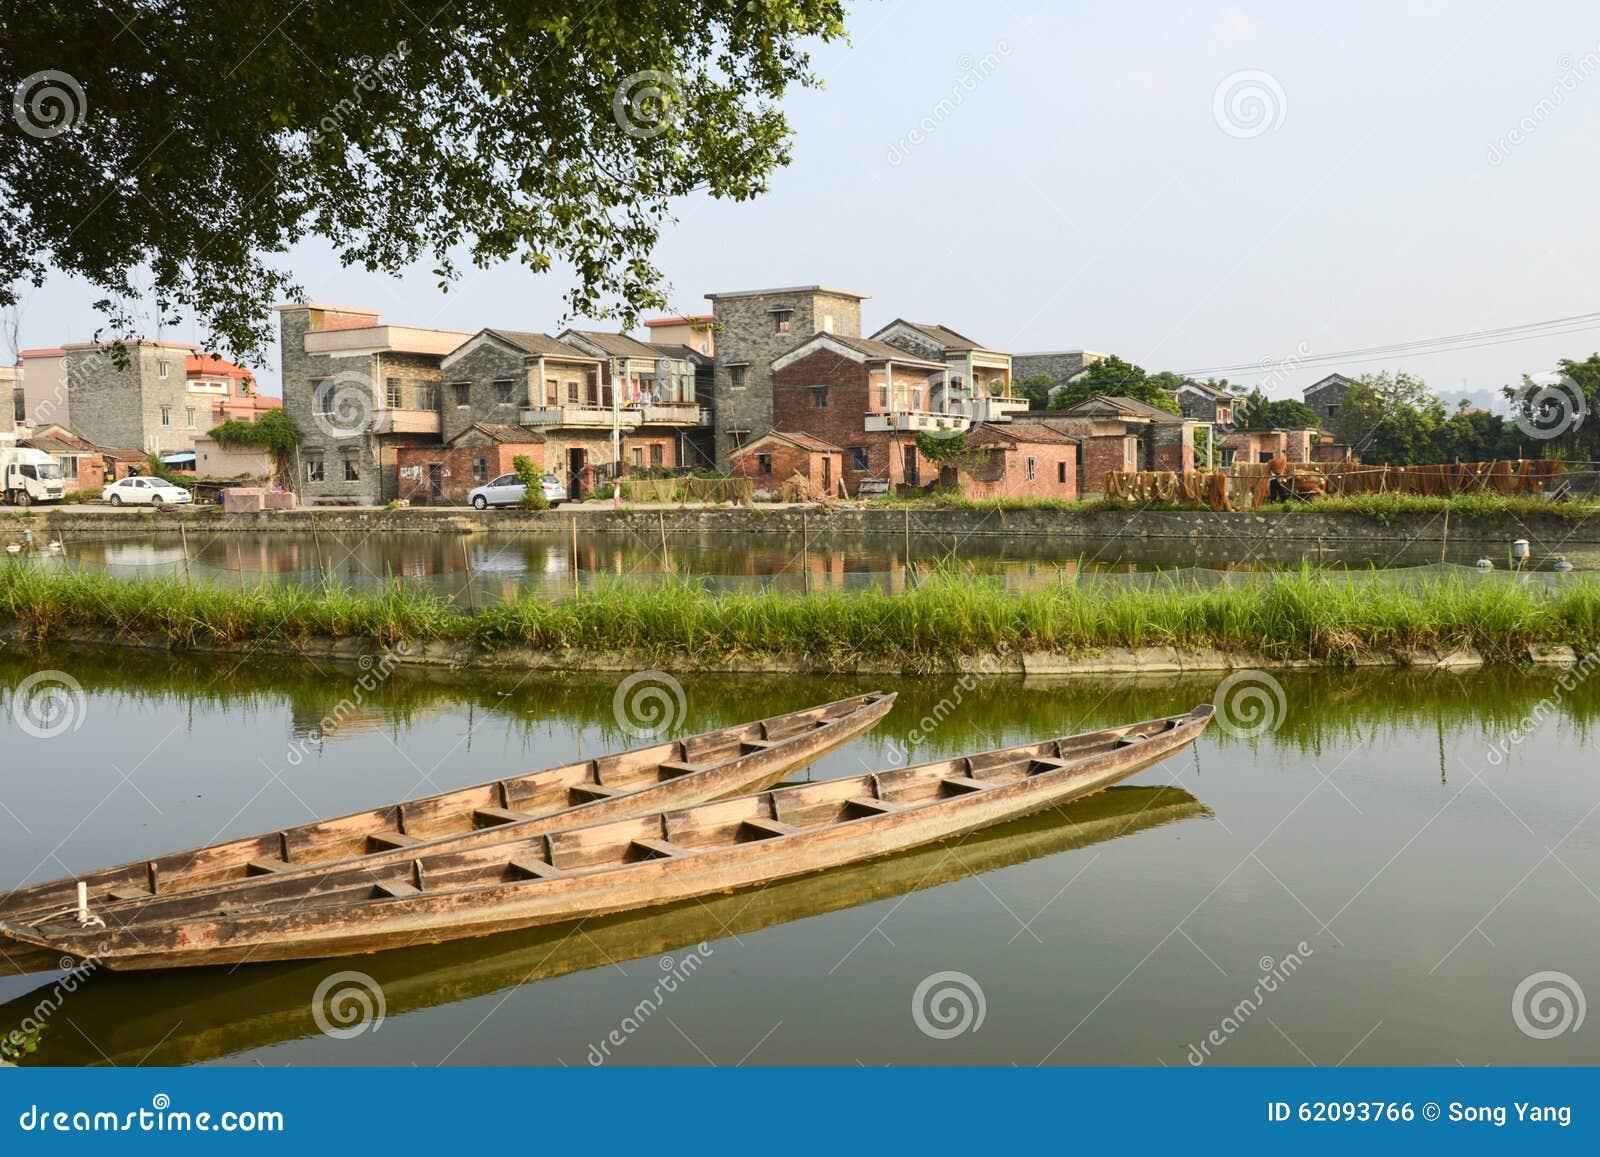 Chinese modern village stock photo Image of asia village 62093766